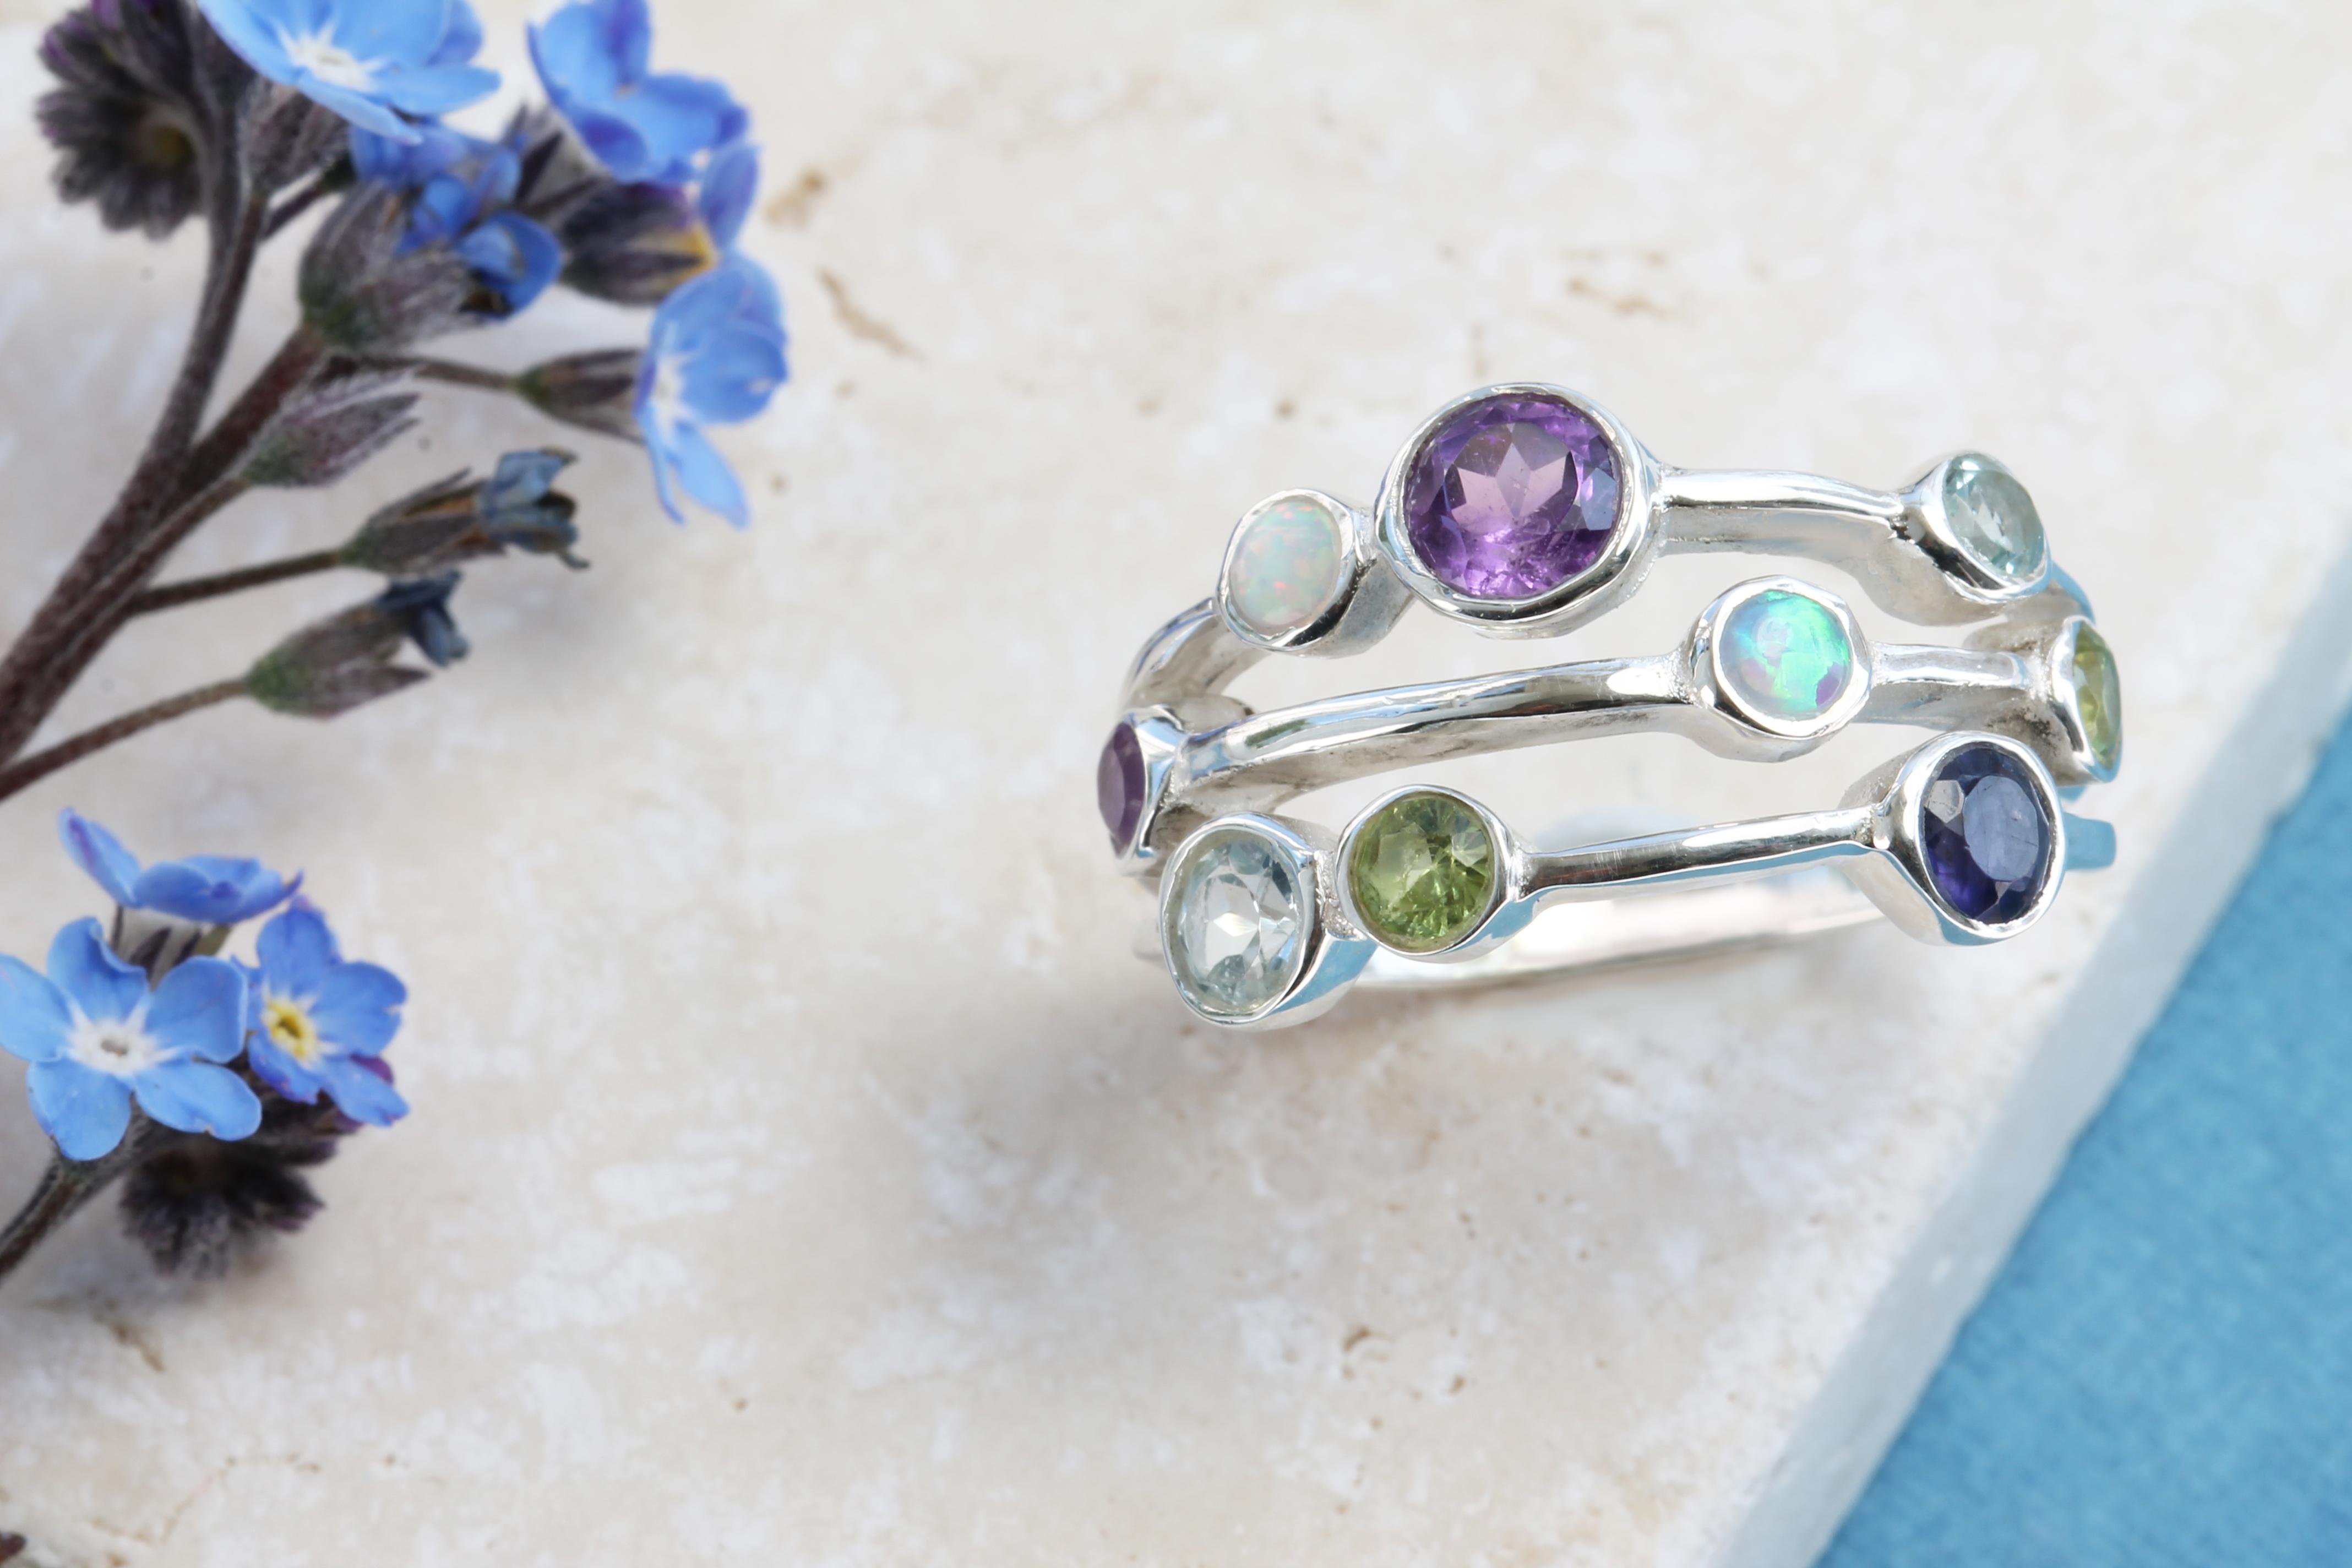 Amethyst, Blue Topaz, Opalite, Peridot & Iolite Ring in Sterling Silver